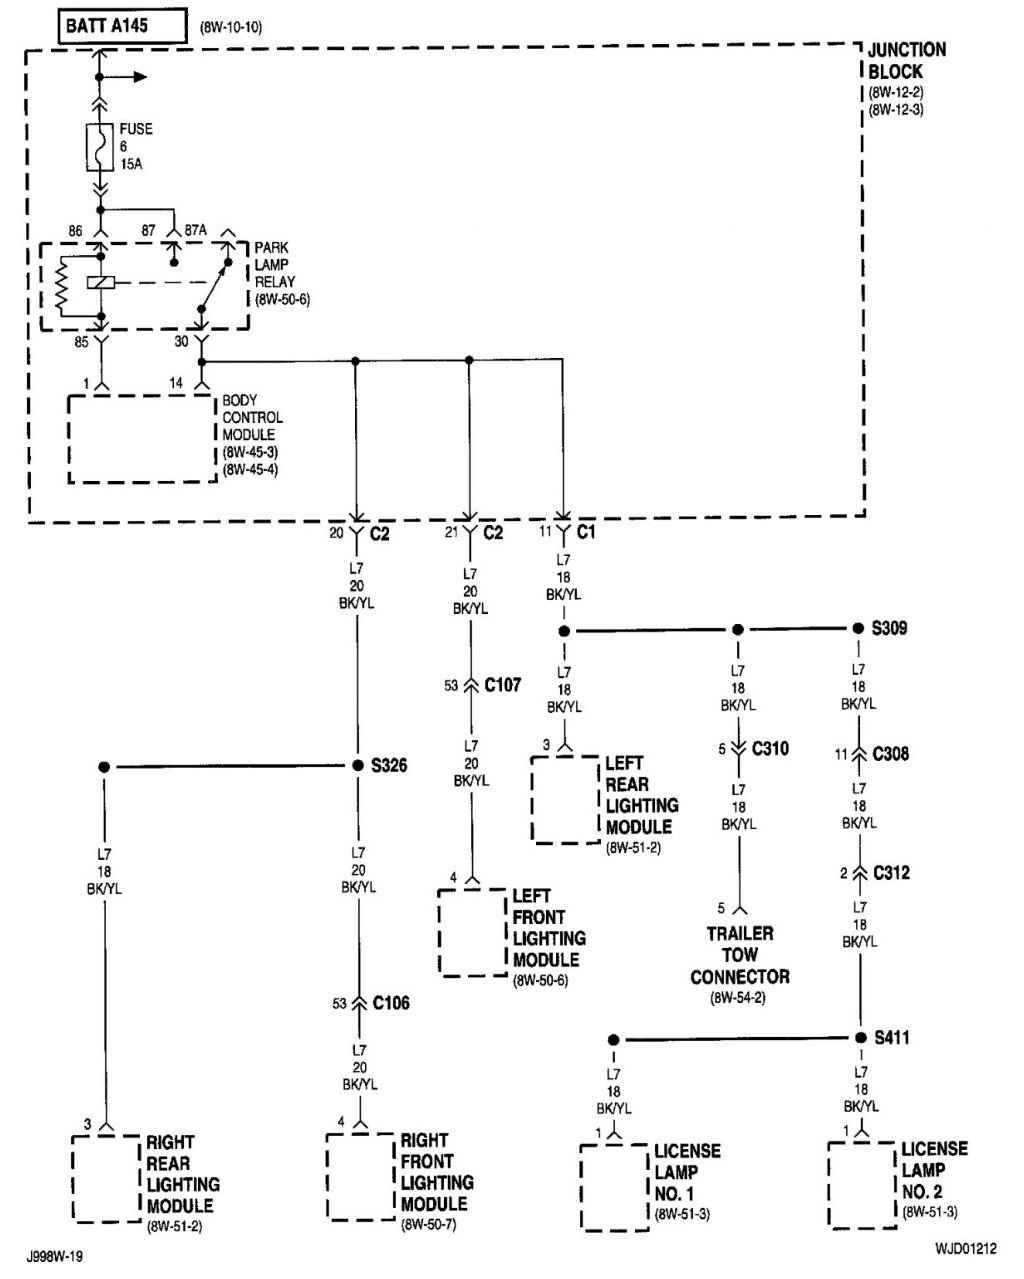 Wiring Diagram Jeeprty Tail Light Wiring Diagram2004 Diagram